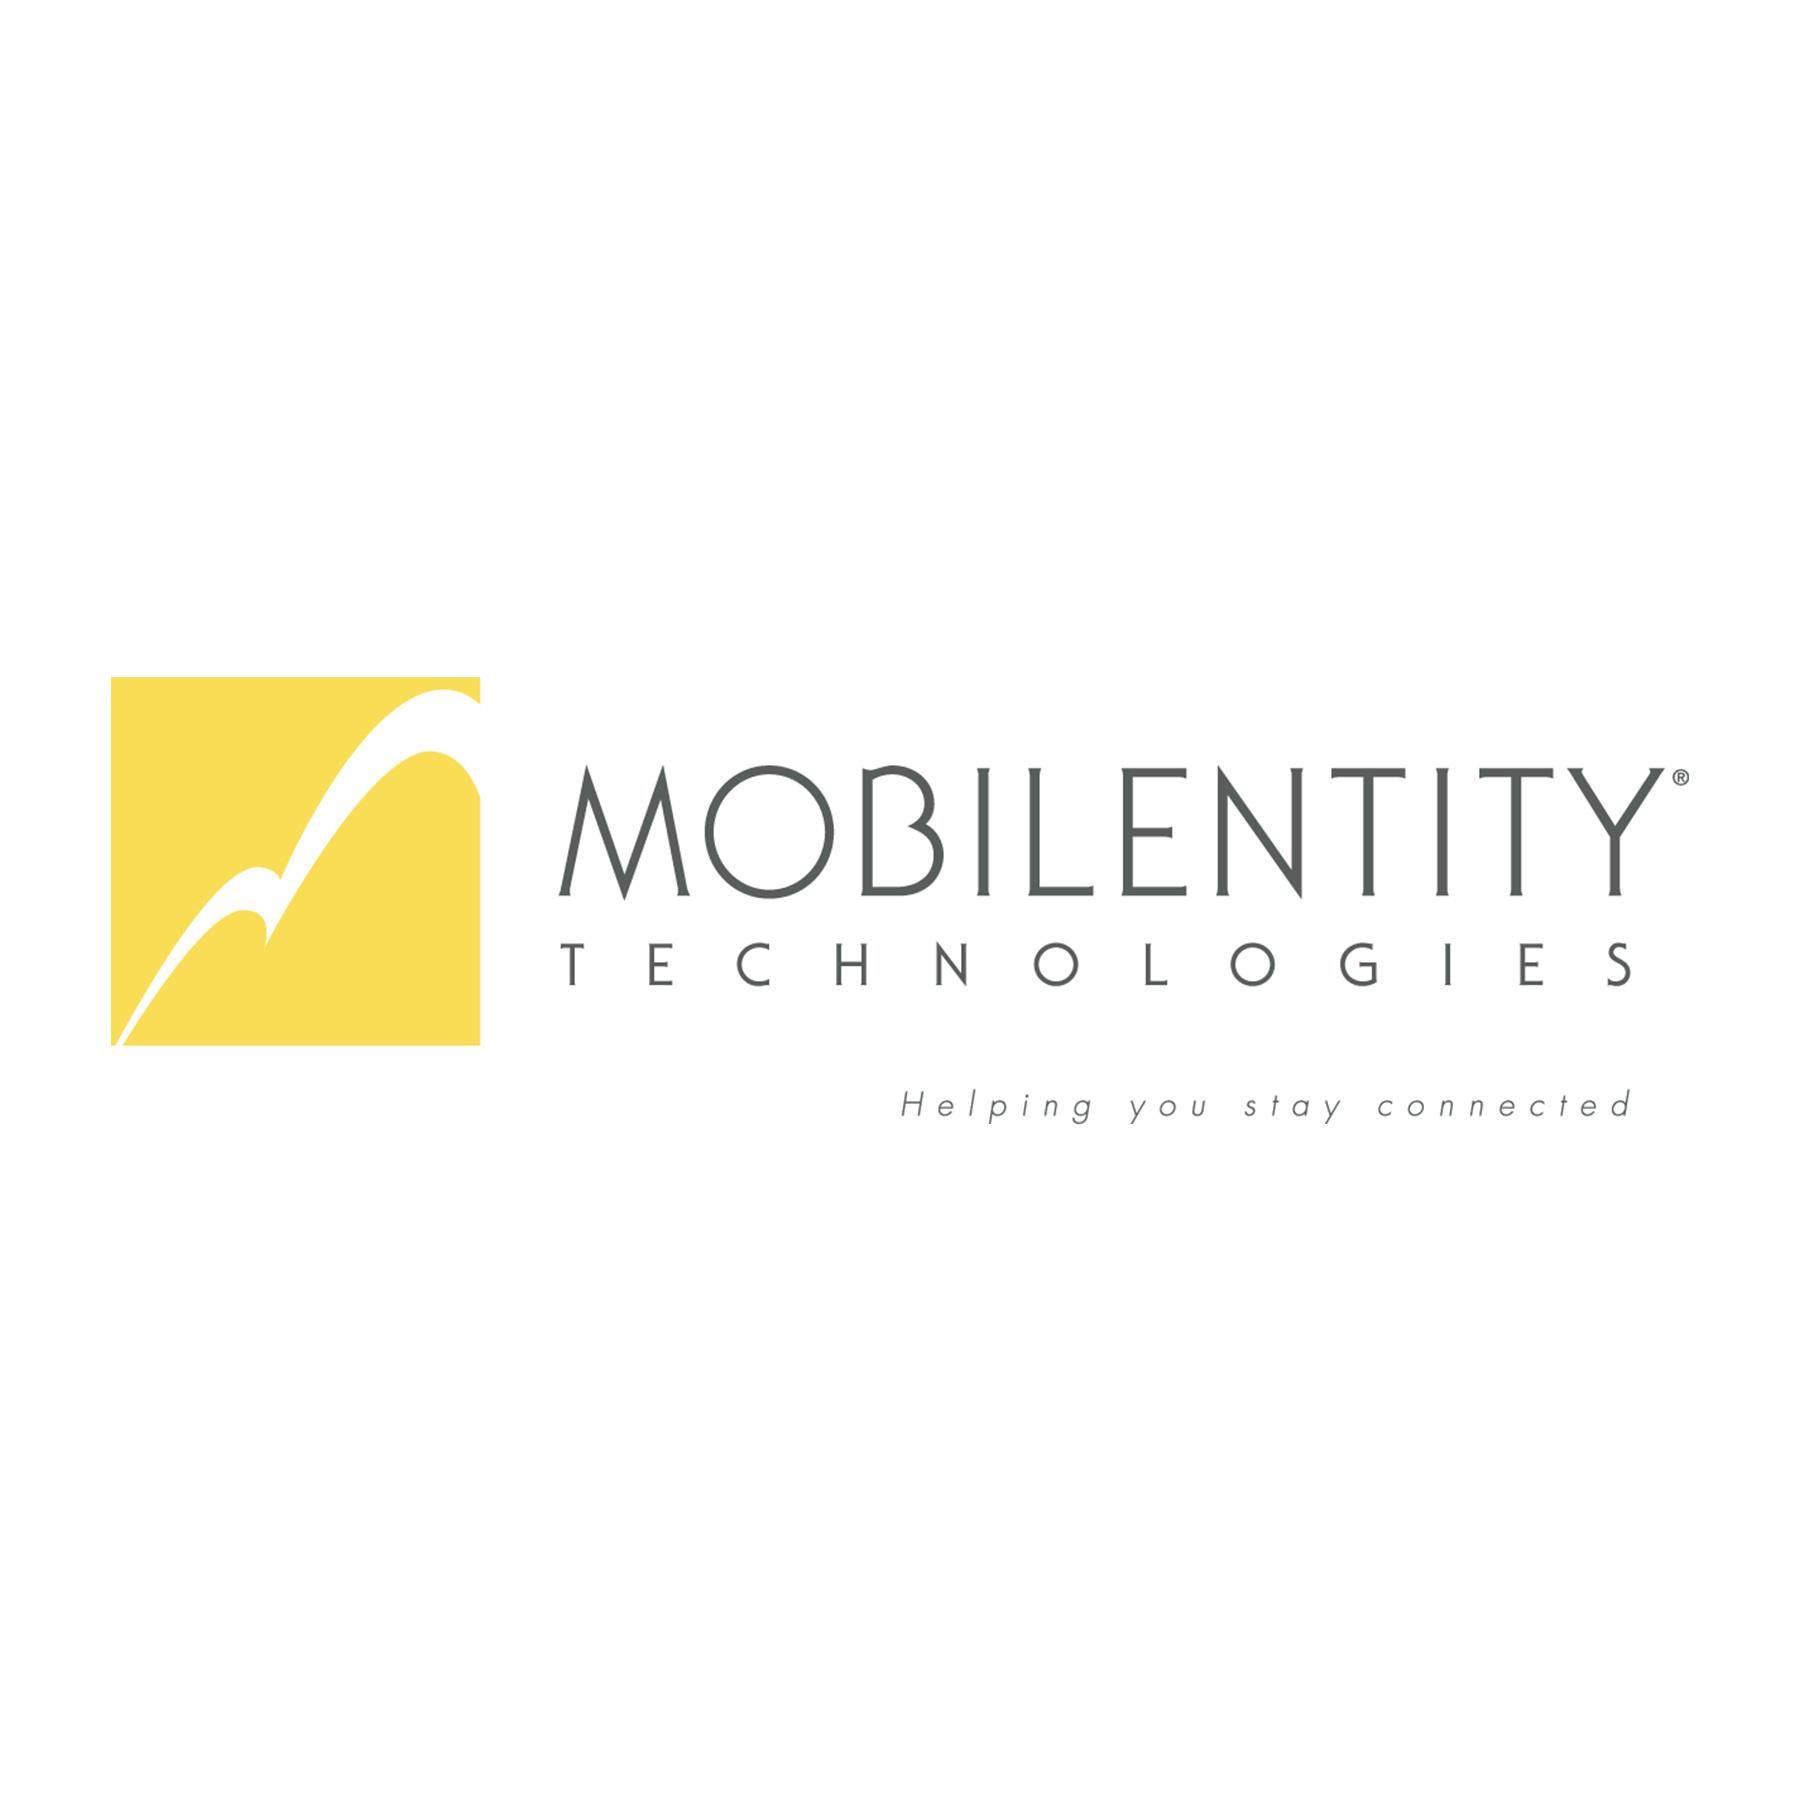 Mobilentity Technologies Company Logo